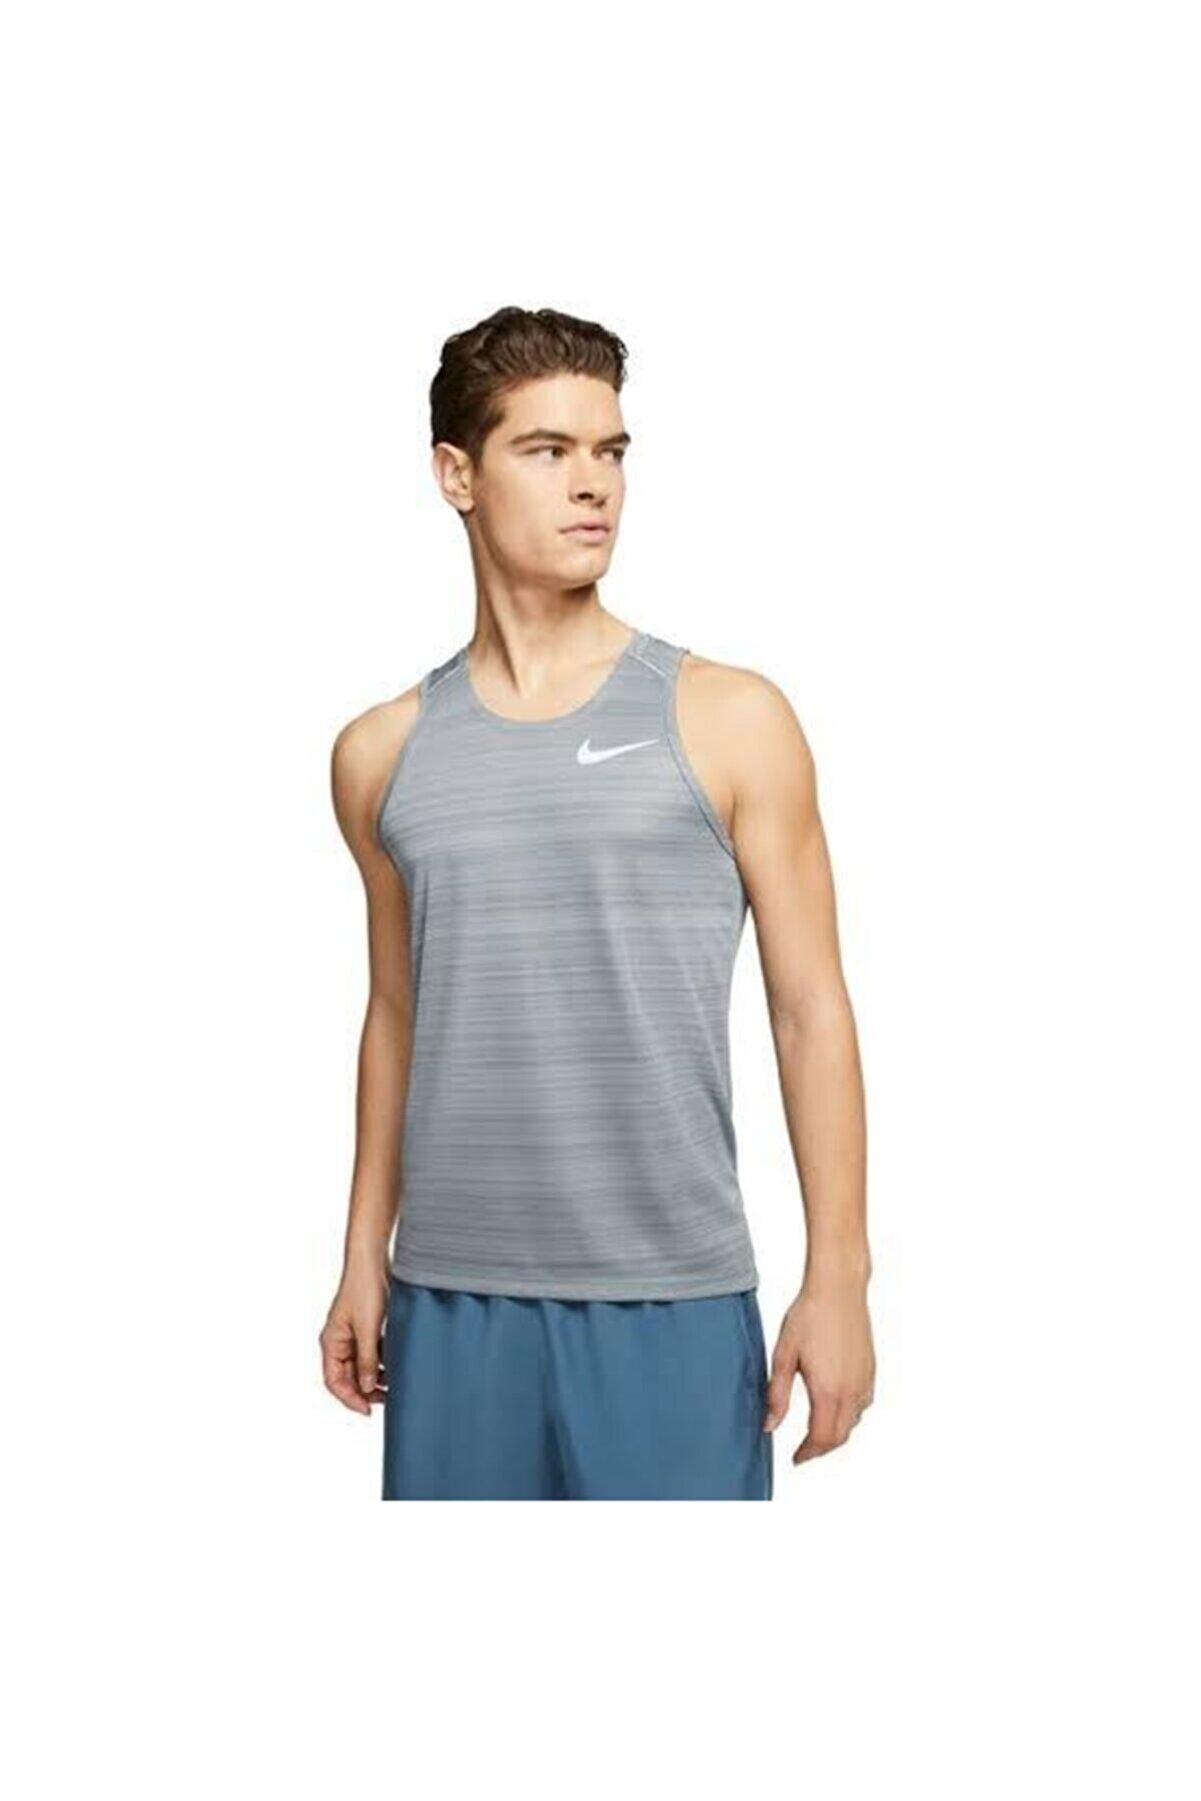 Nike Dri-fit Breathe Miler Men's Running Vest Tank Top